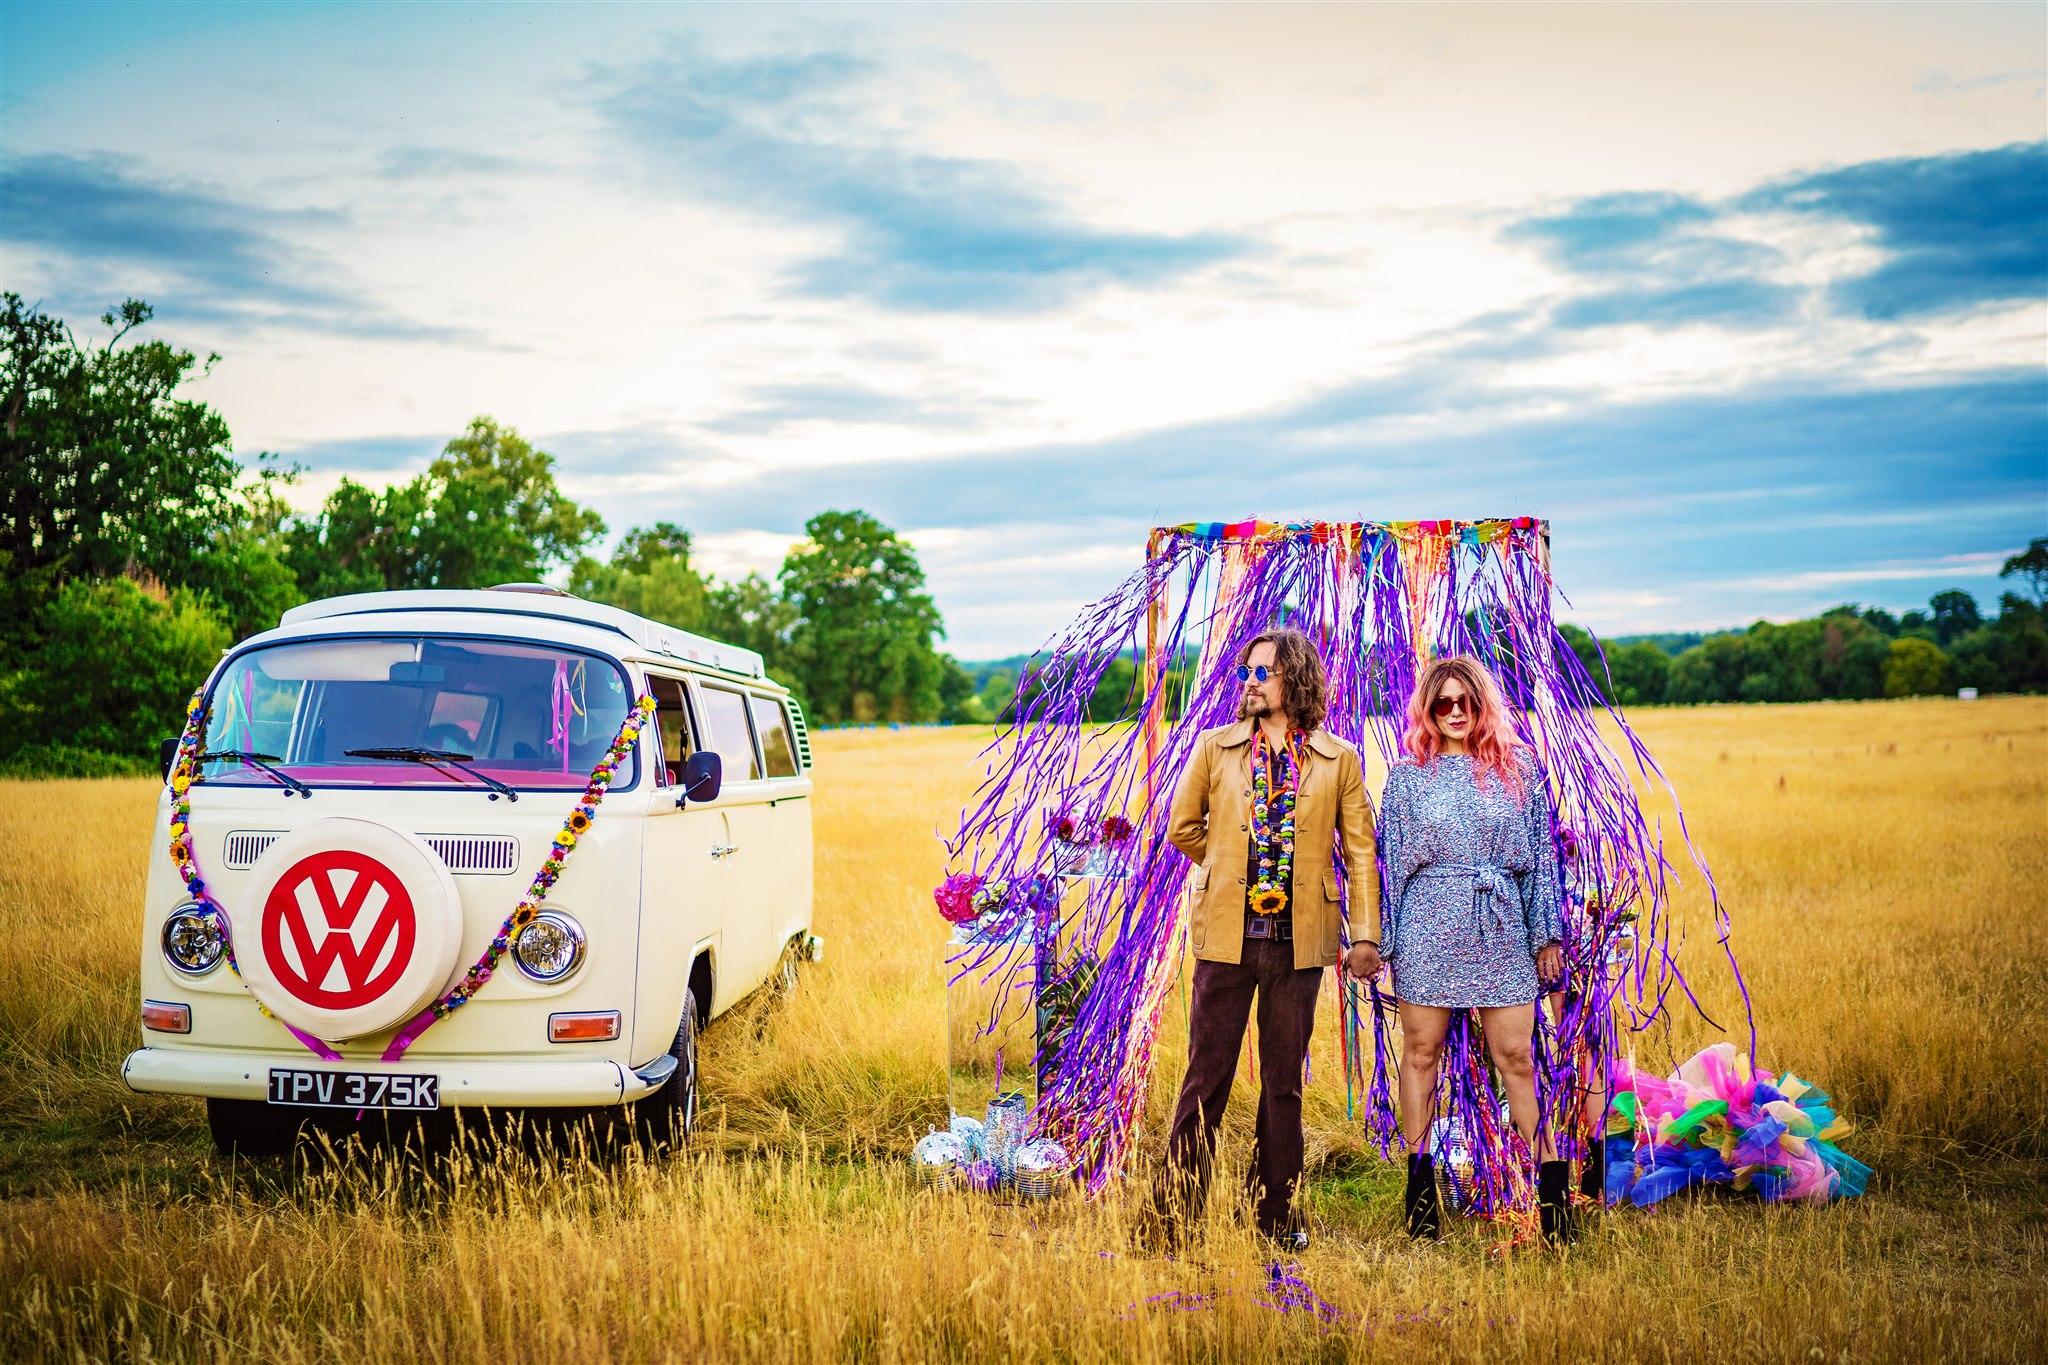 colourful bohemian wedding - 70s wedding - campervan wedding - hippie wedding - alternative wedding